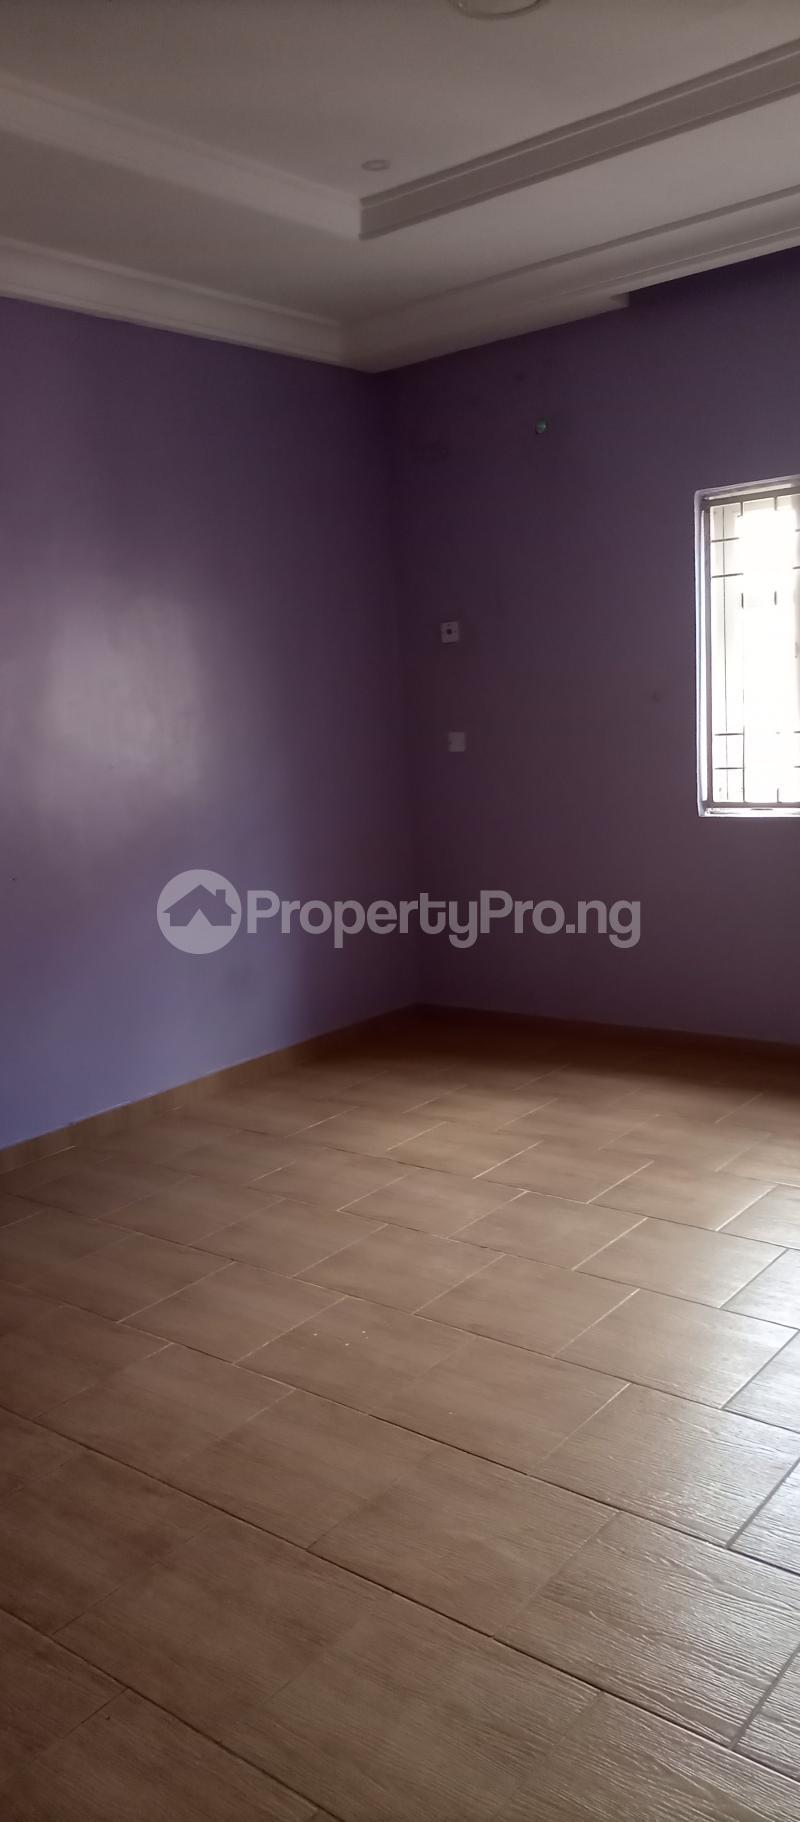 2 bedroom Flat / Apartment for rent Beside Victorotti School, Olokuta, Idi Aba Idi Aba Abeokuta Ogun - 4